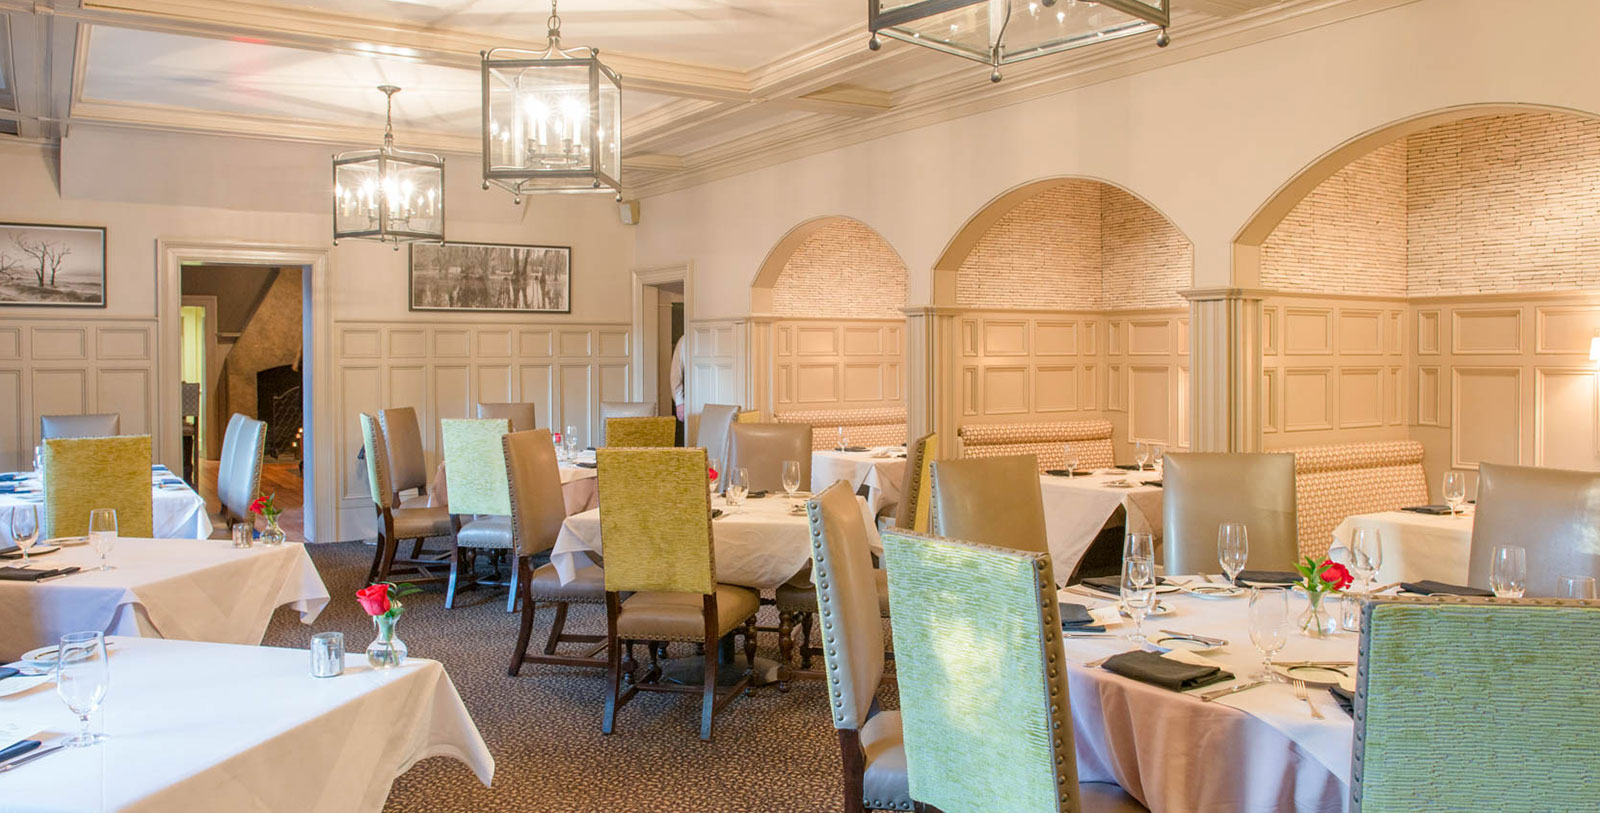 Image of Dining Room at Circa 1886 Restaurant, Kings Courtyard Inn in Charleston, South Carolina, 1853, Member of Historic Hotels of America, Taste